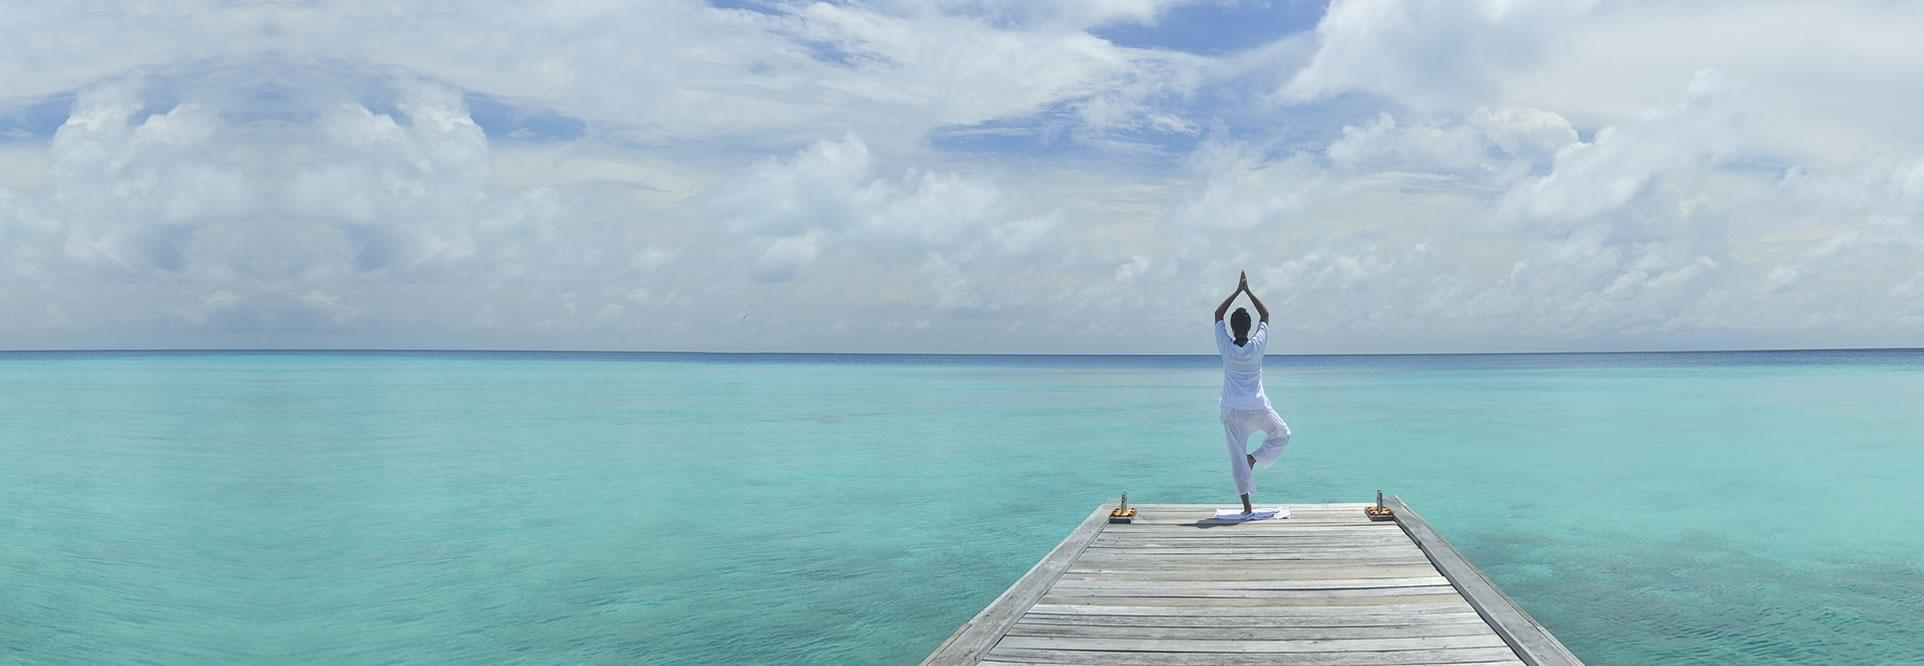 Yoga La rochelle cours de yoga La Rochelle cours privé yoga La Rochelle